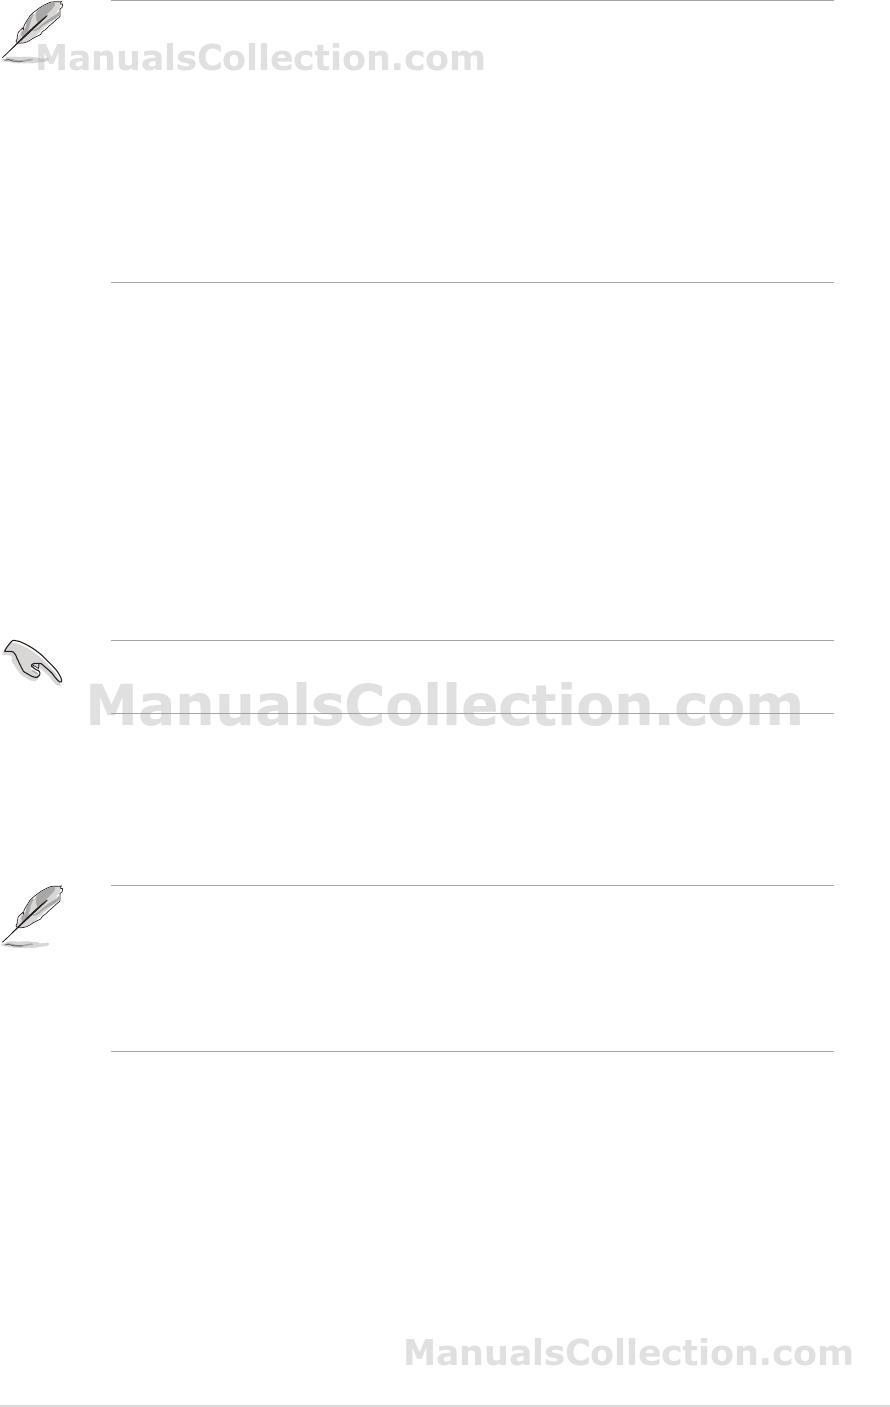 asus p5e deluxe manual pdf